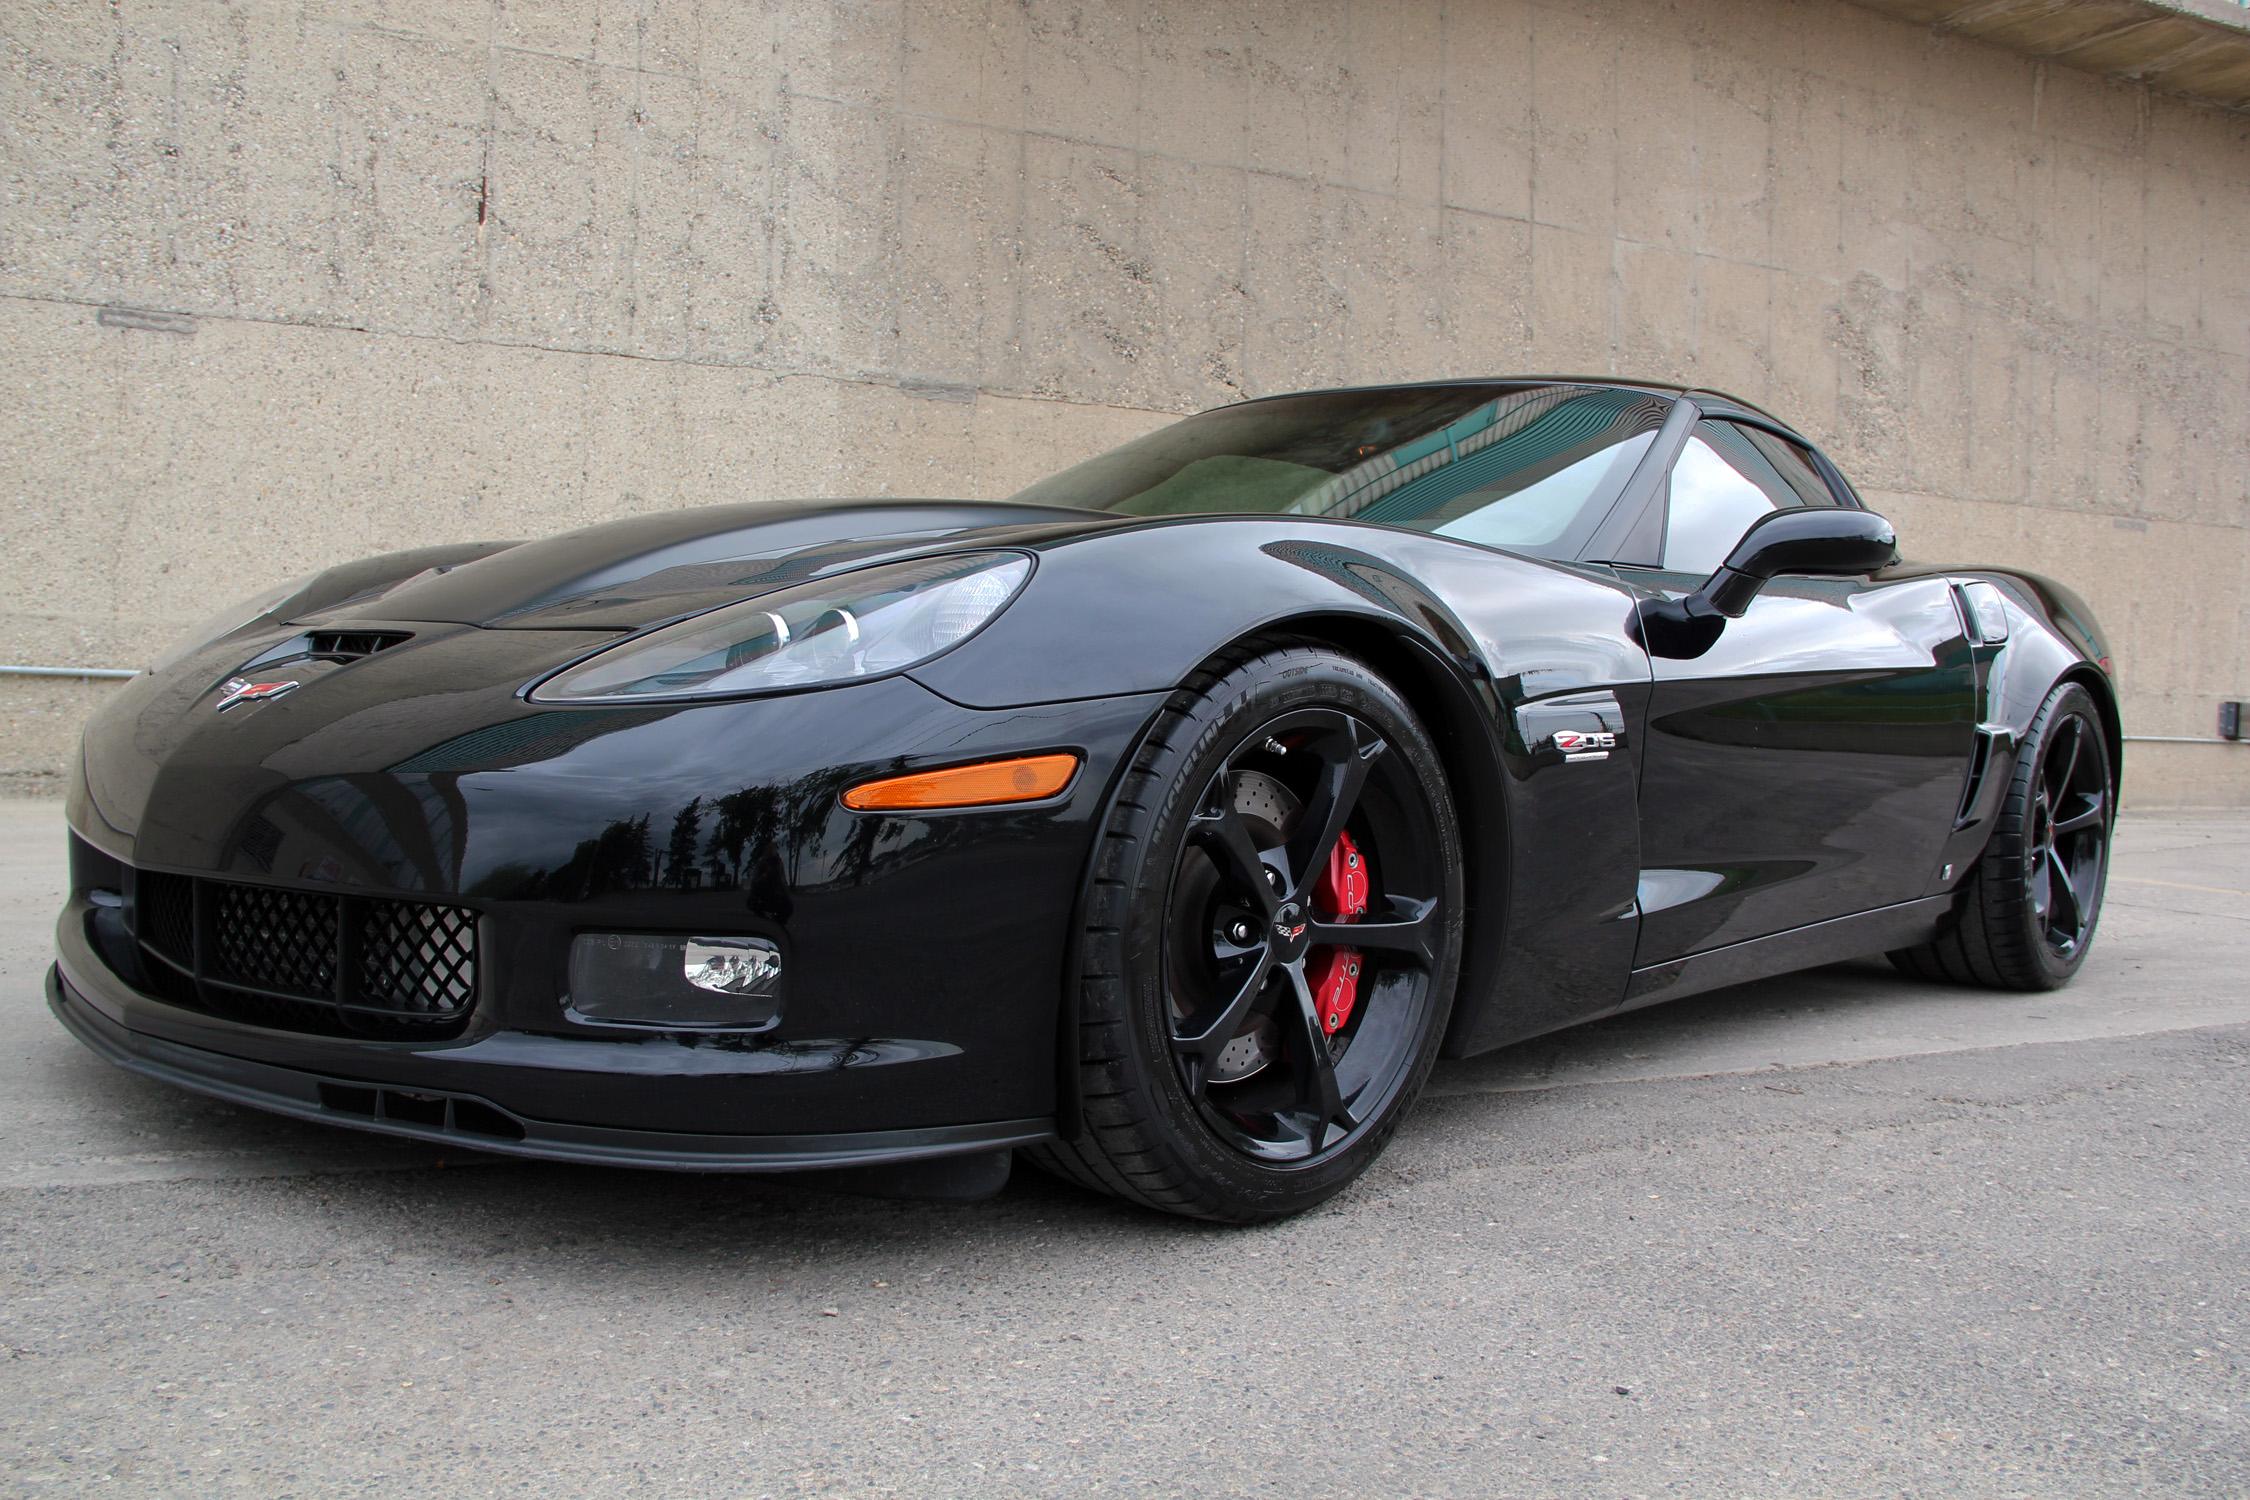 2009 corvette z06 supercharged the beast envision auto. Black Bedroom Furniture Sets. Home Design Ideas